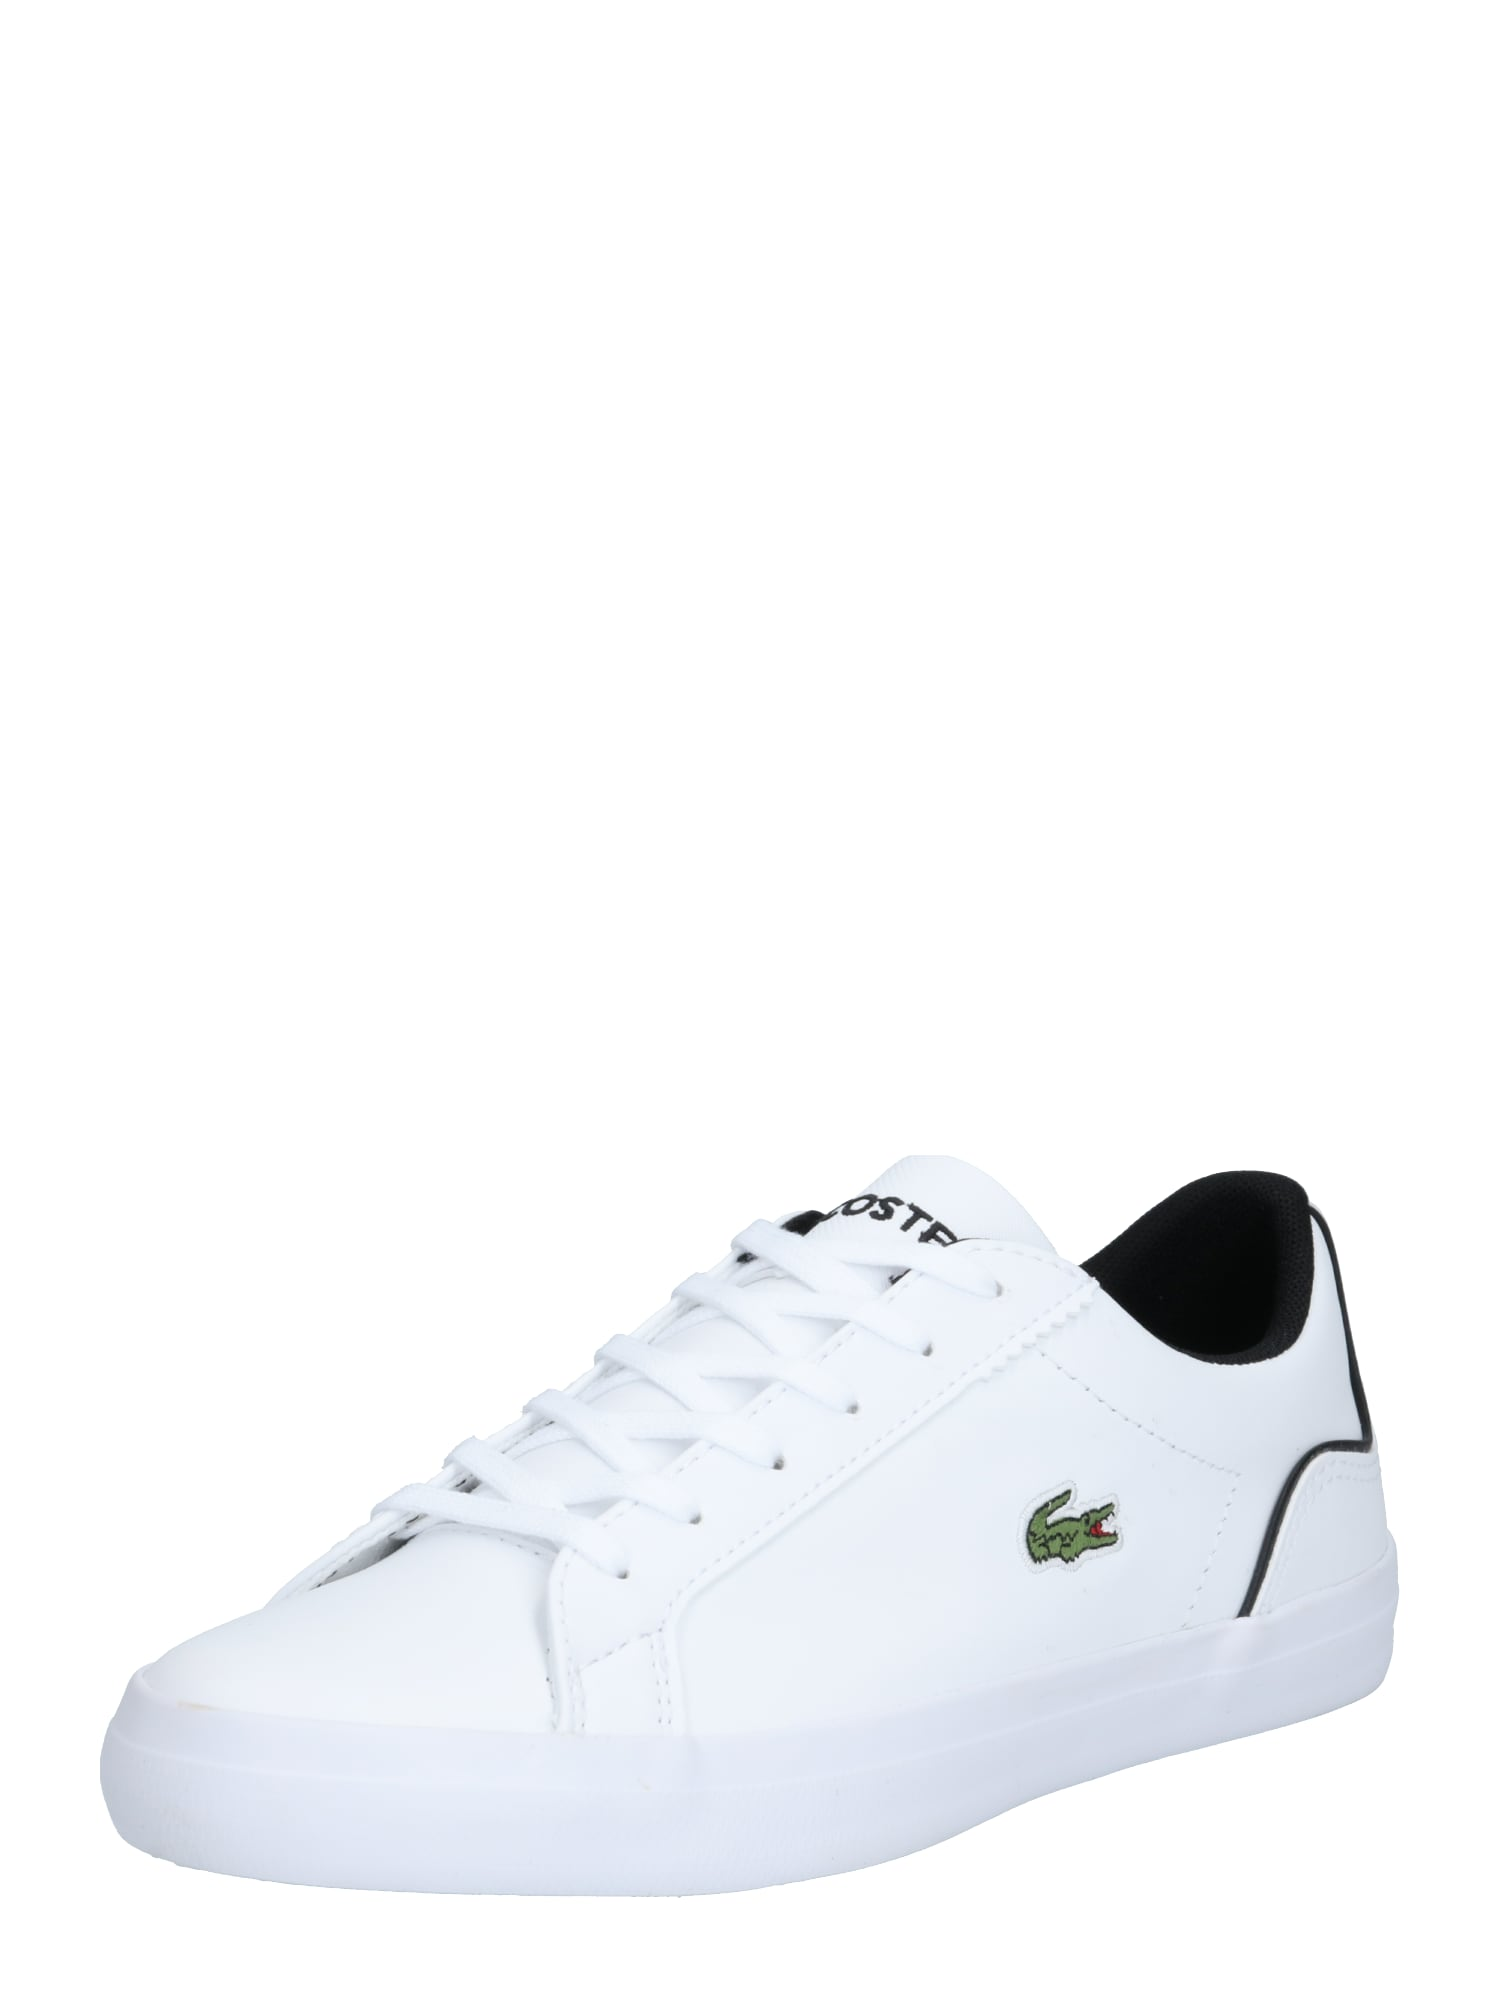 LACOSTE Nízke tenisky 'Lerond 0120'  čierna / biela